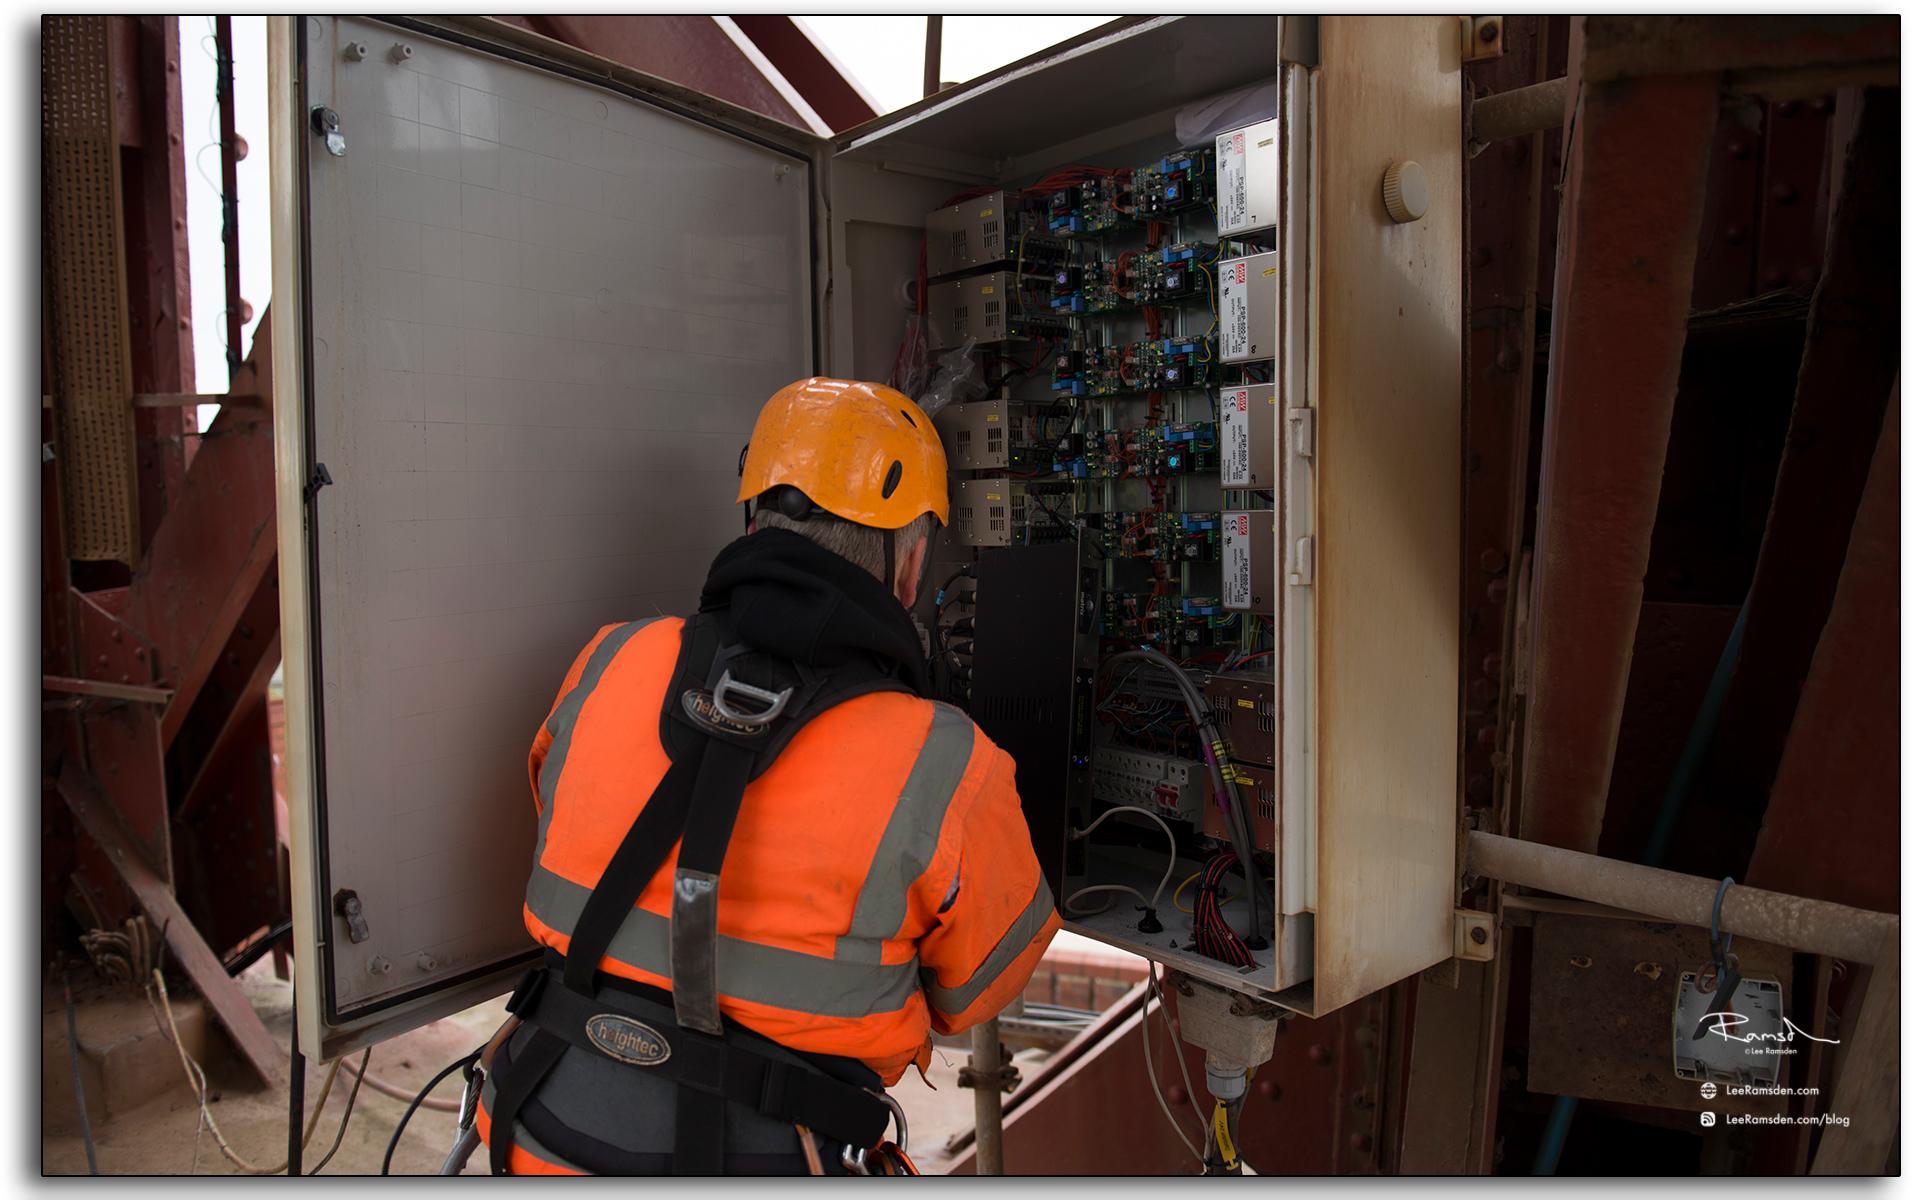 Blackpool illuminations electronics, control gear, electrician, technician